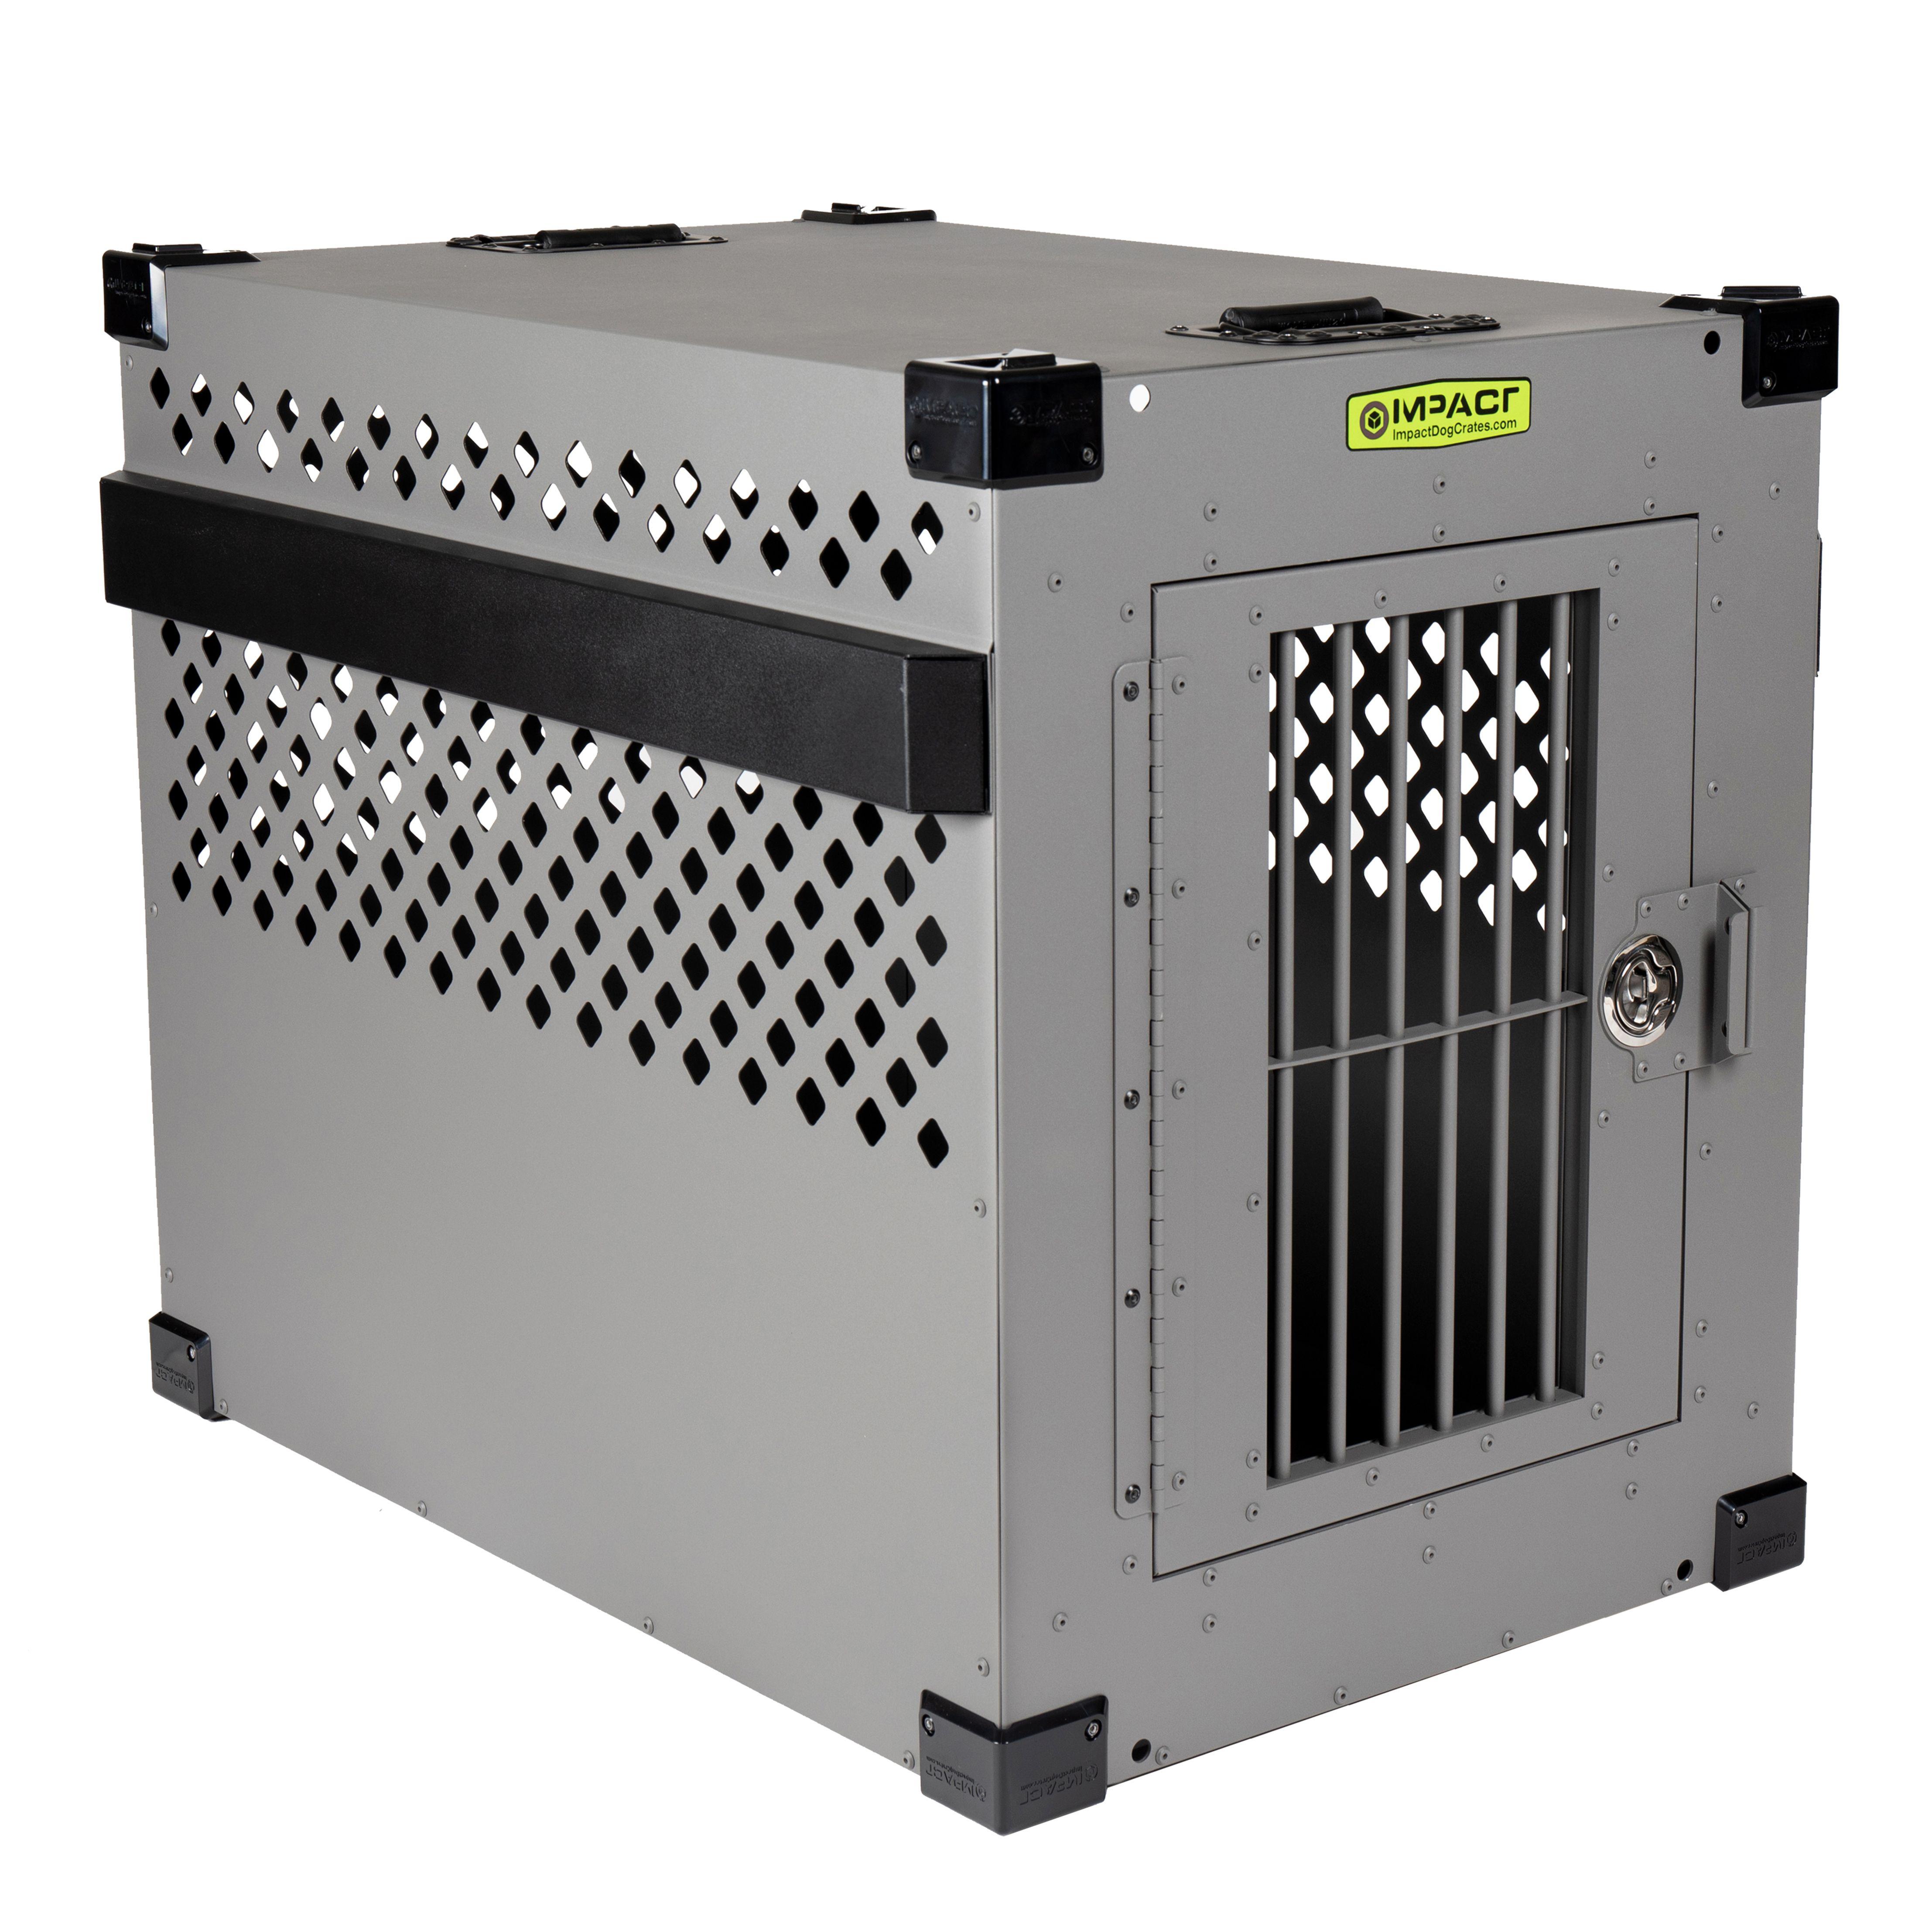 Diy dog puzzles dog crate aluminum dog crates heavy